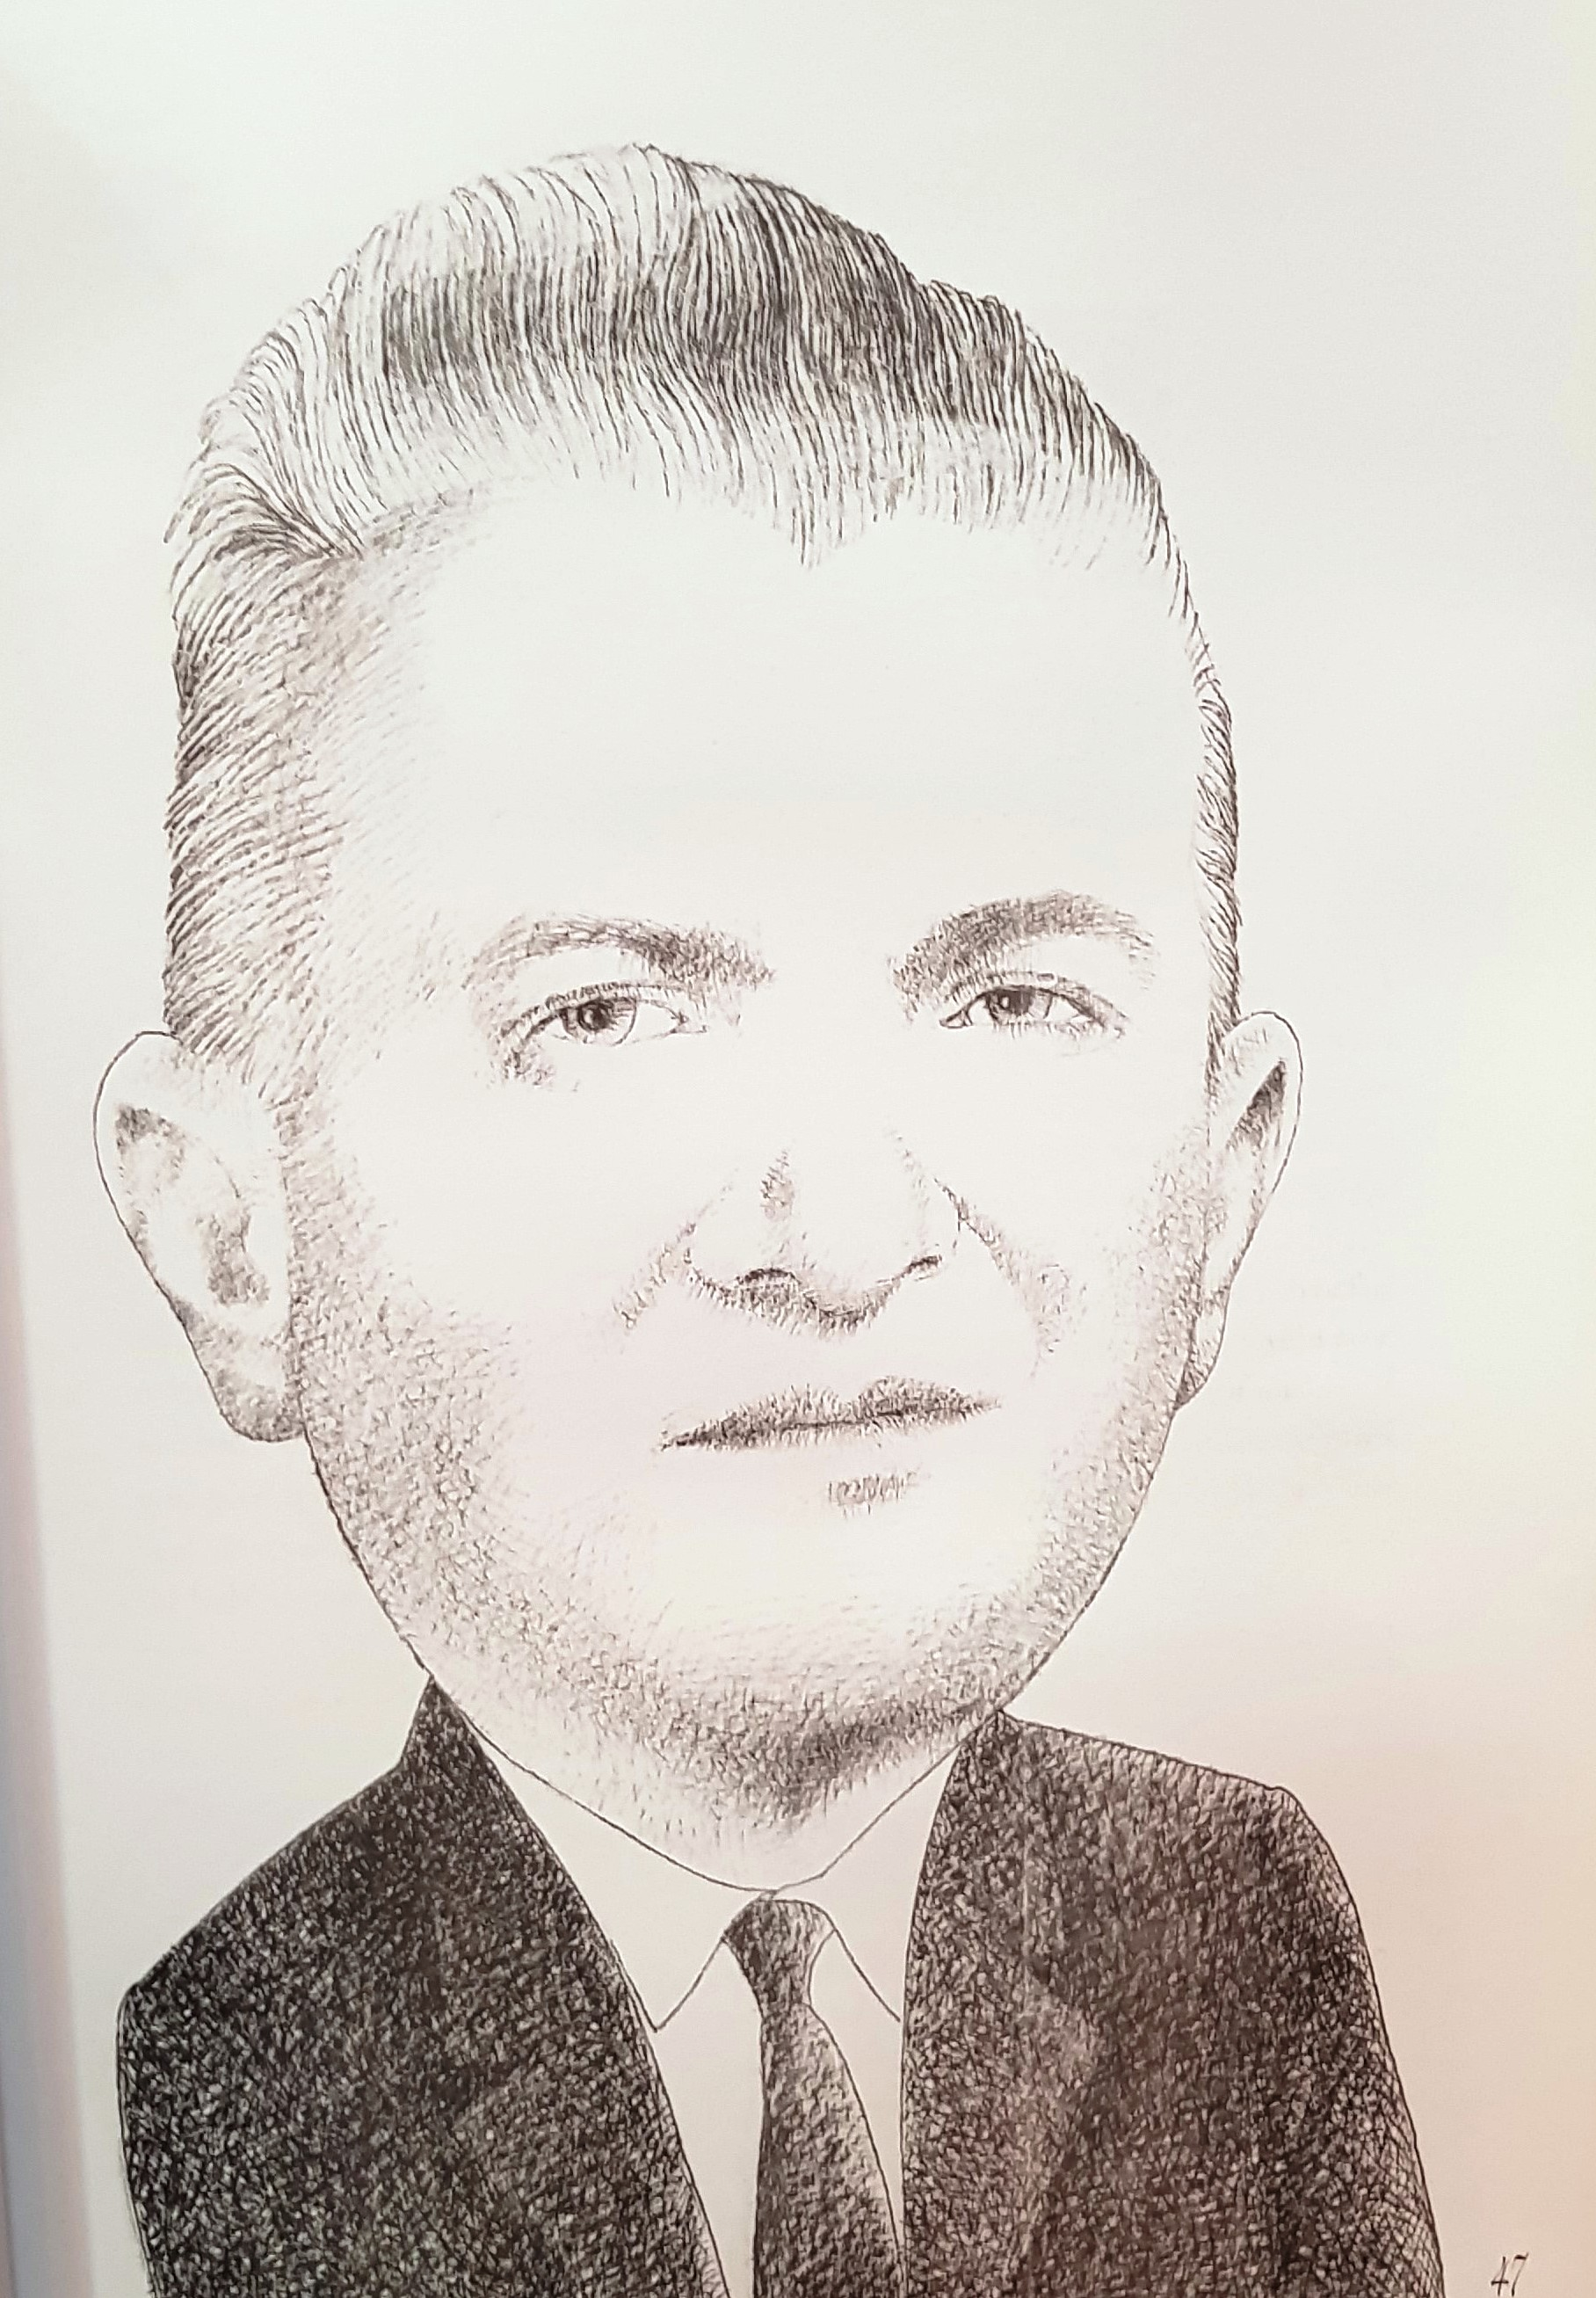 DR. ENRIQUE ESCALANTE ALFARO